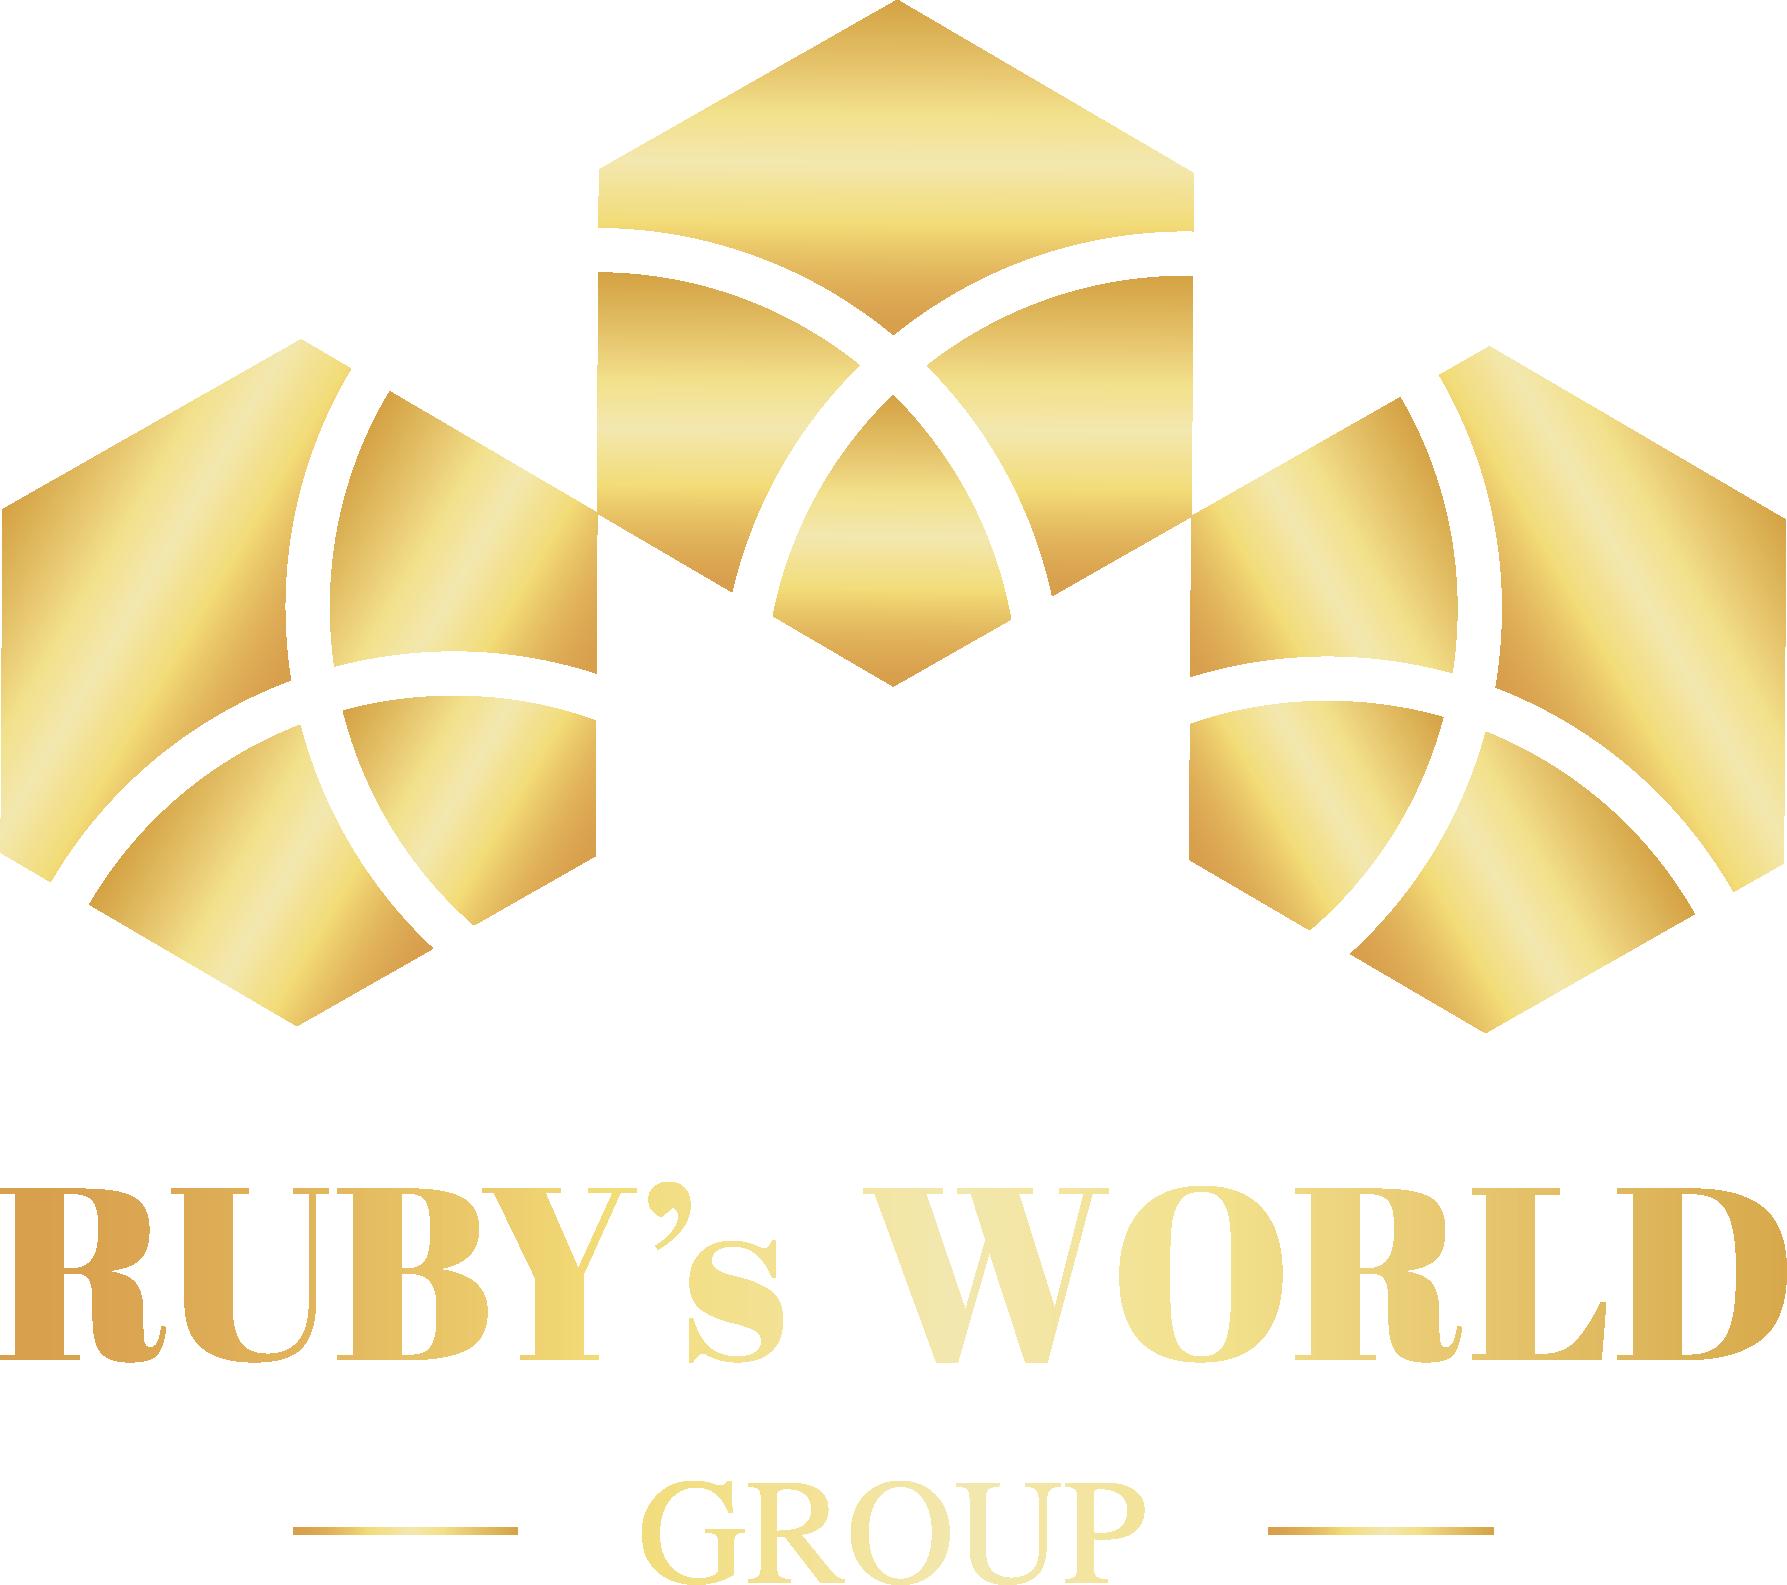 Standard-Logo-Rubys-World-Group